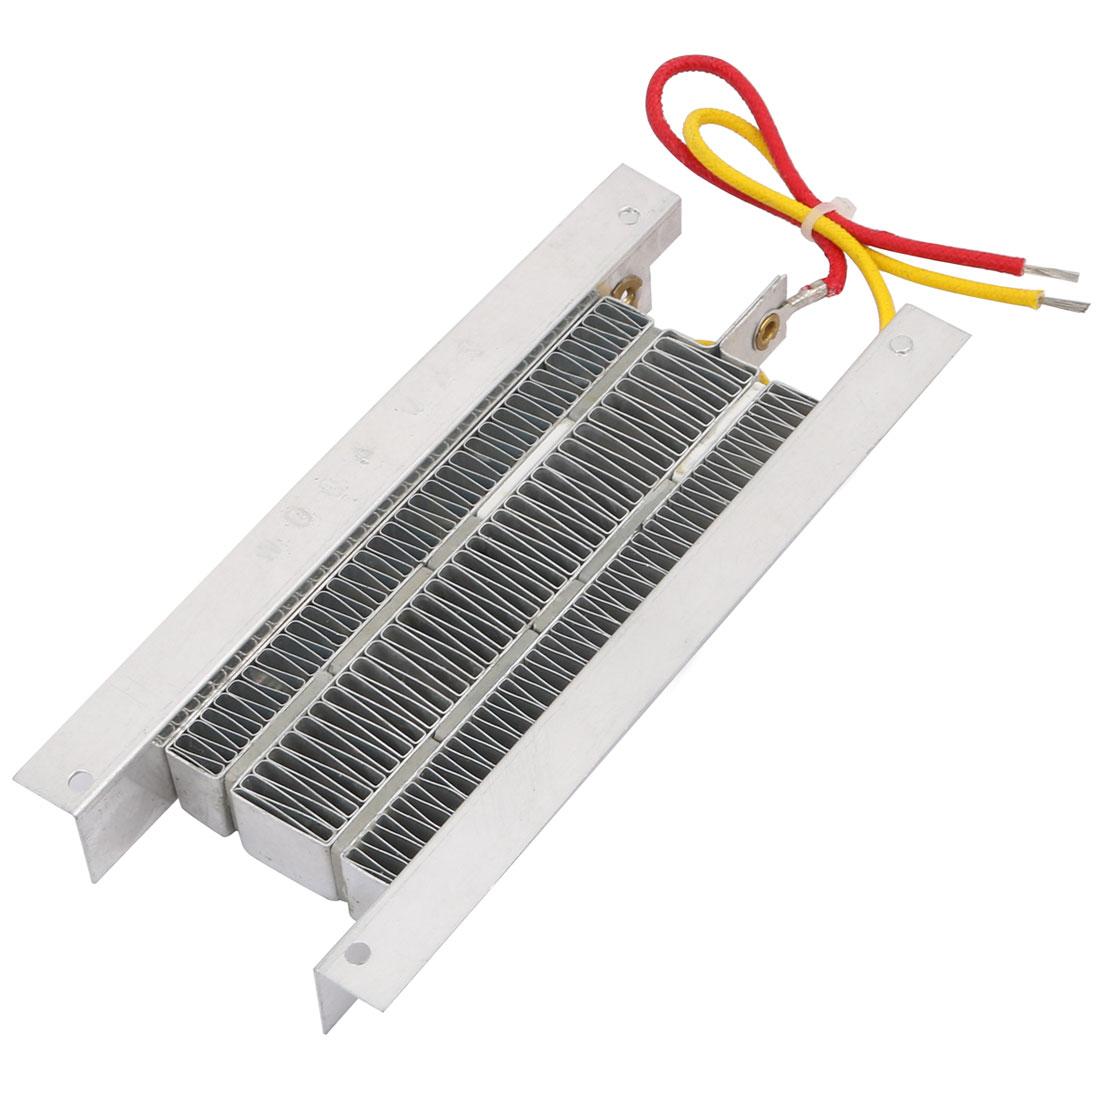 24V 400W Electric Ceramic Thermostatic PTC Heating Element Heater